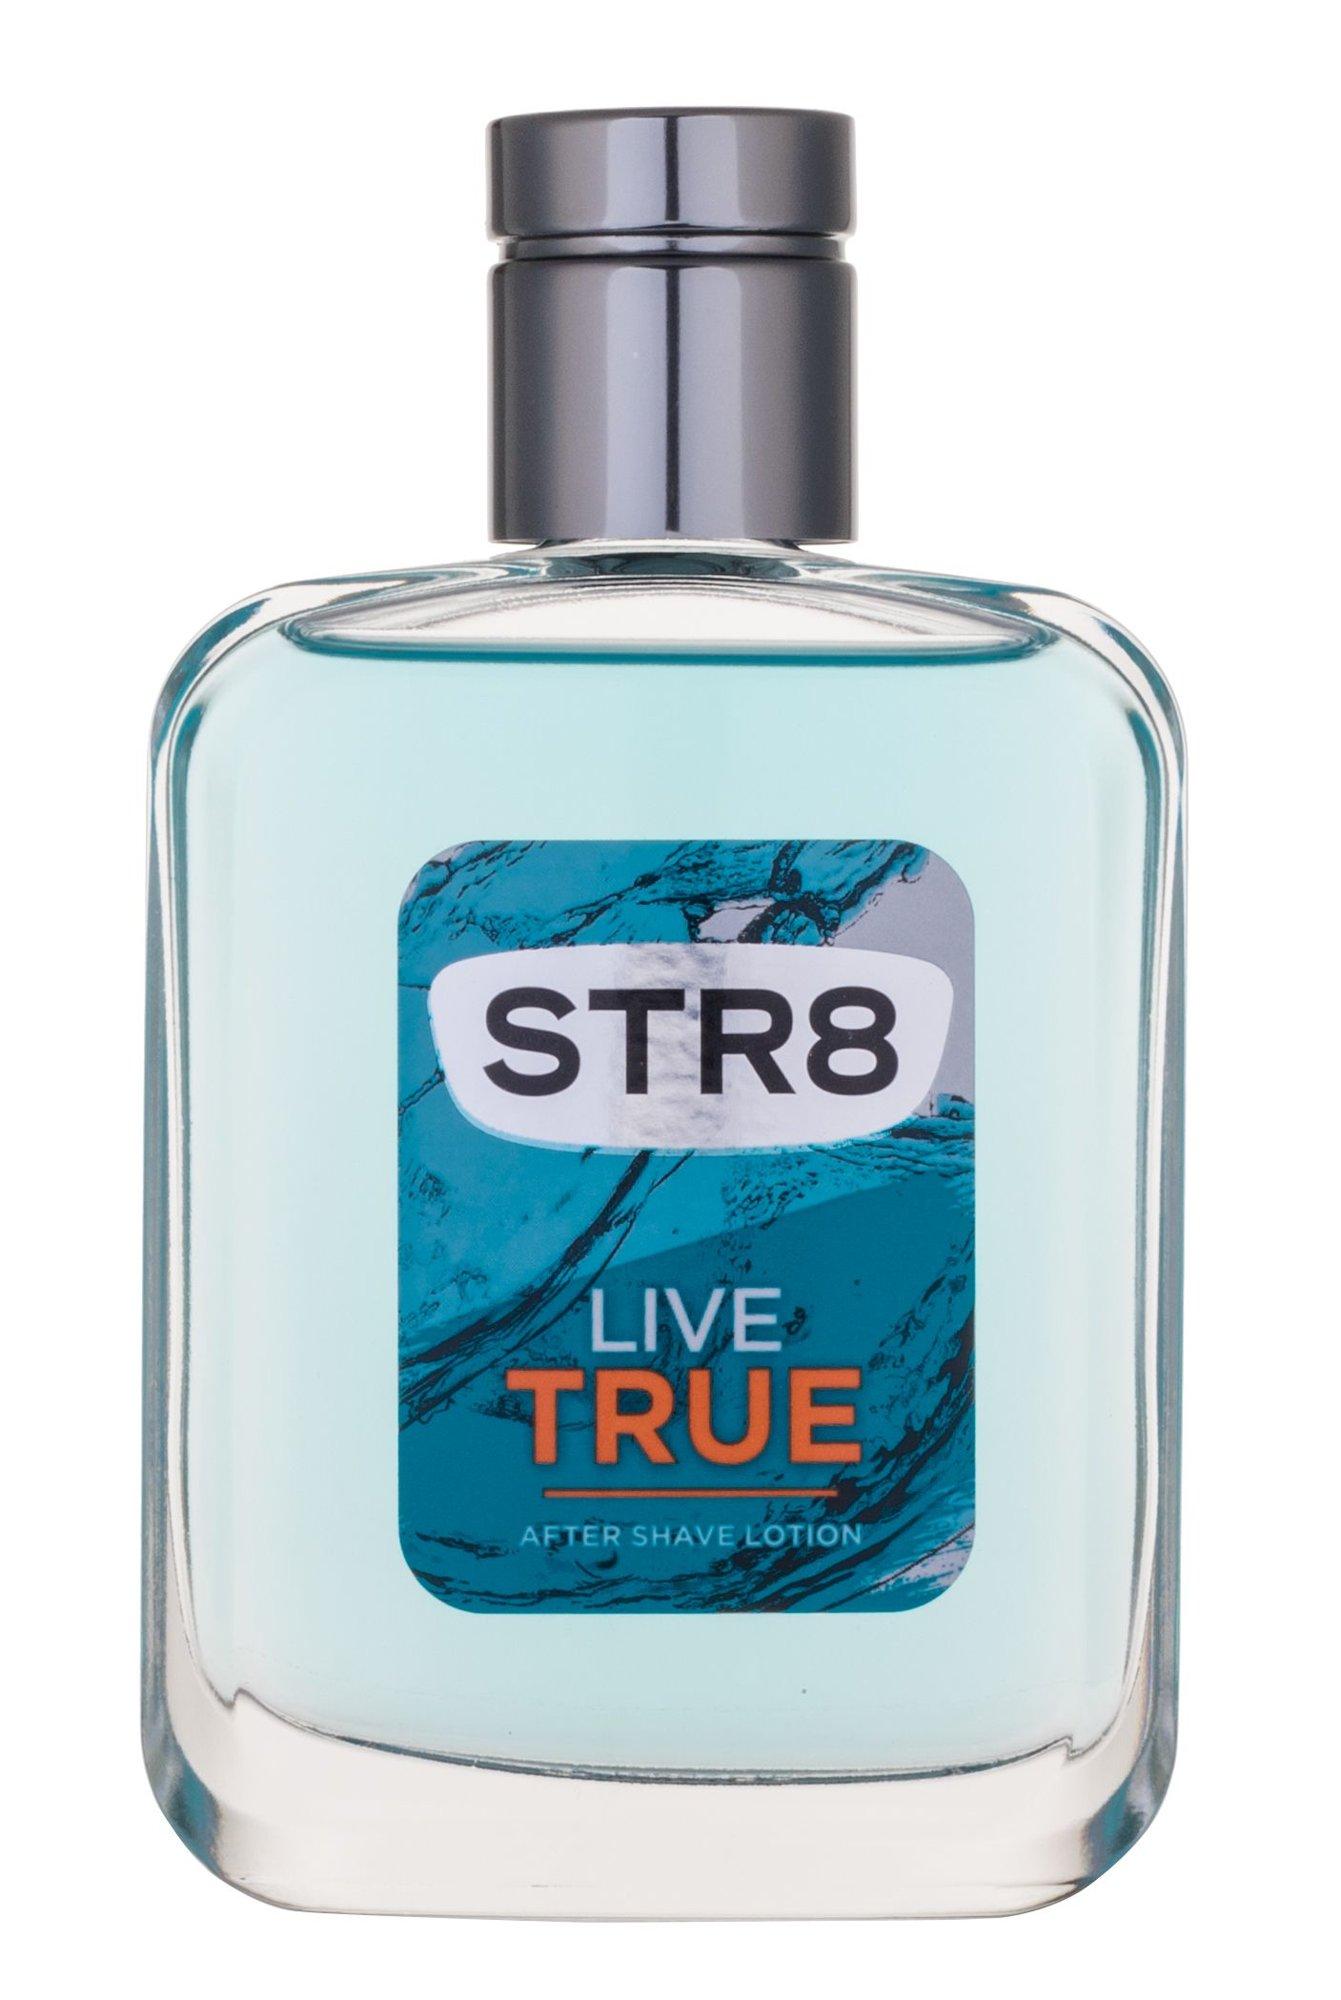 STR8 Live True Aftershave 100ml